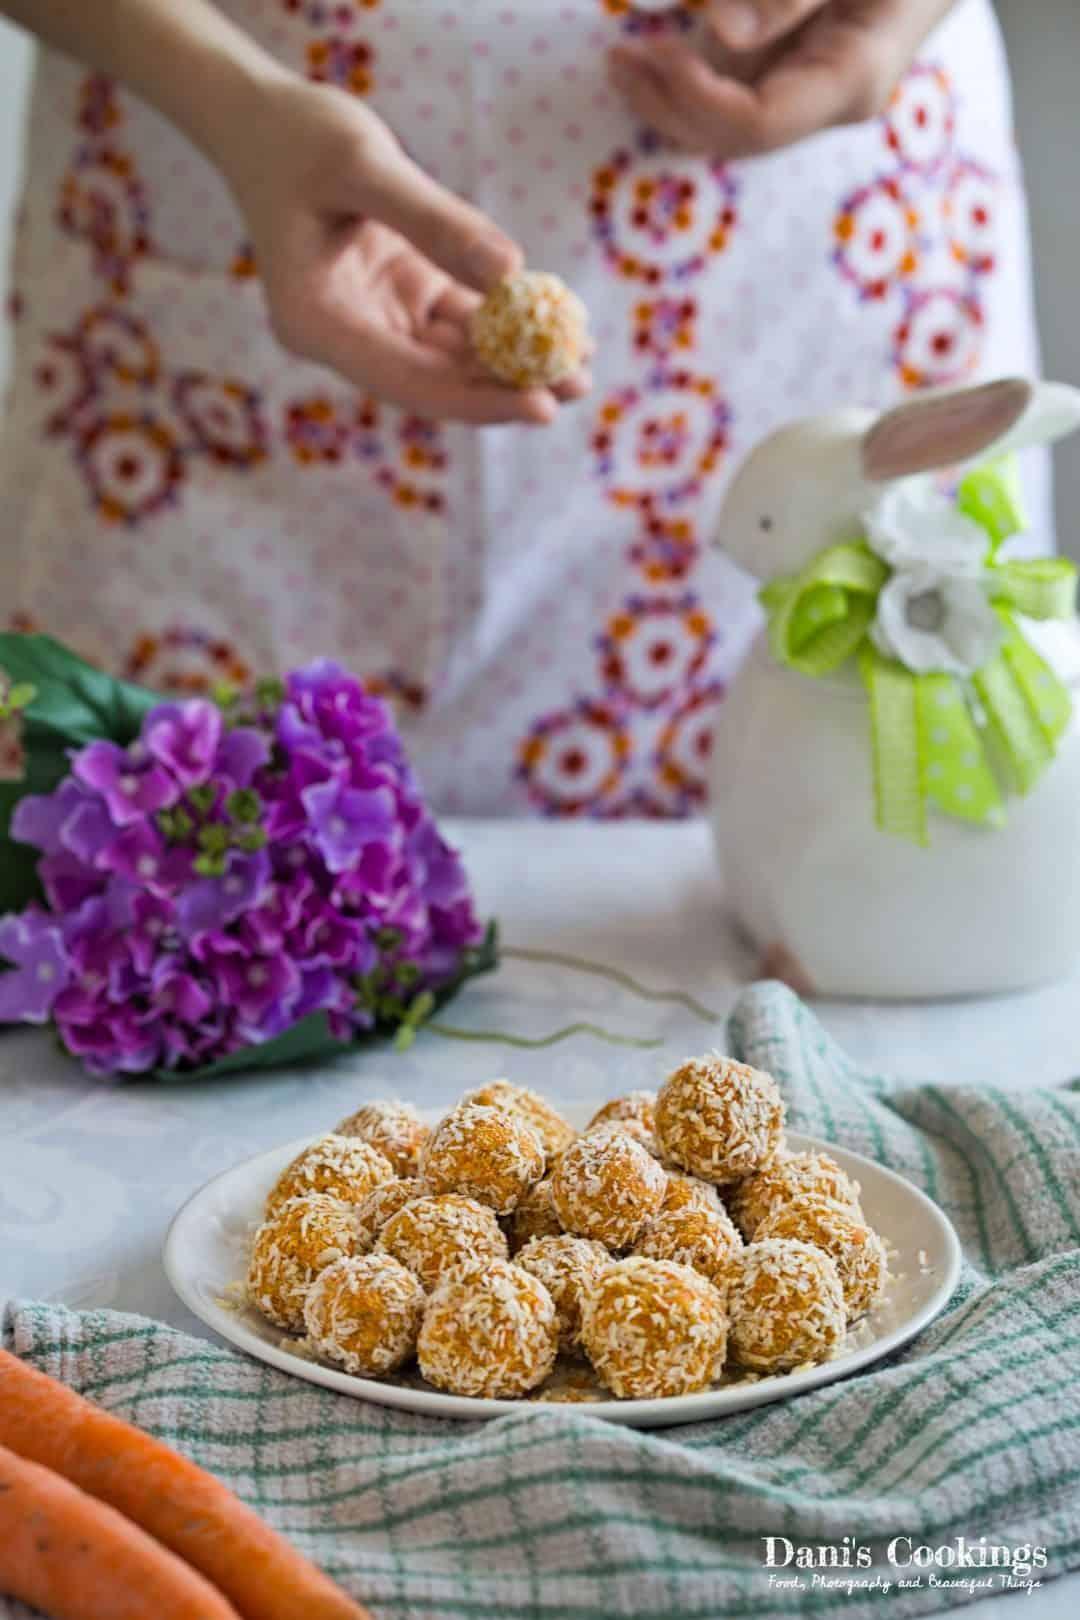 kid friendly meal preps - raw carrot truffle